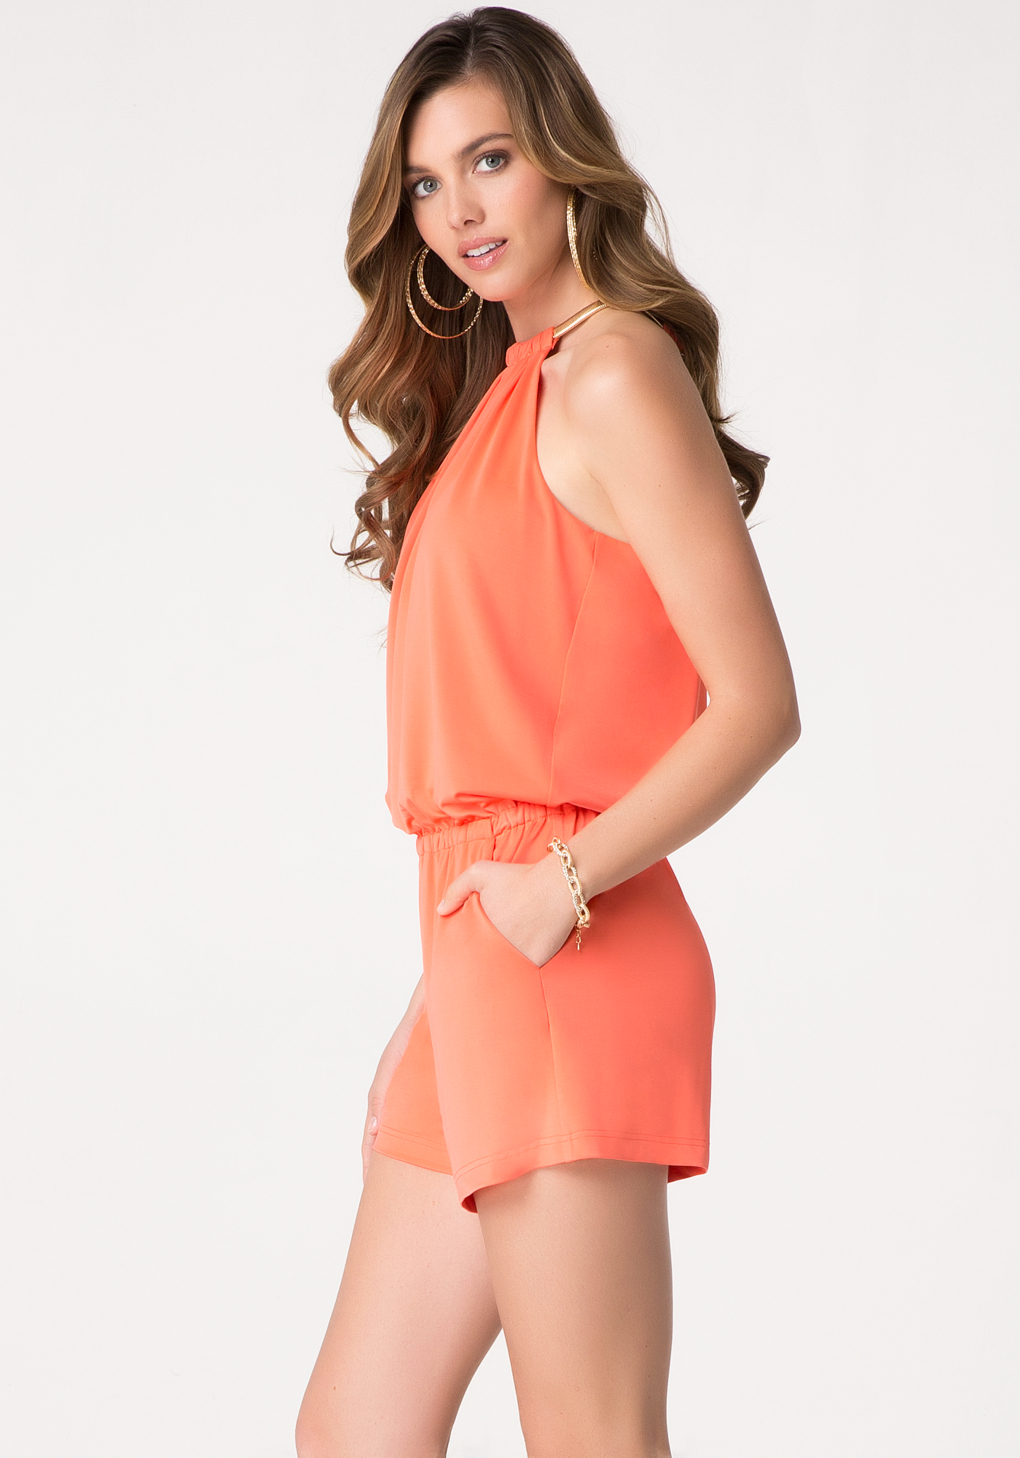 Jessica Simpson Pink Jumpsuit Front